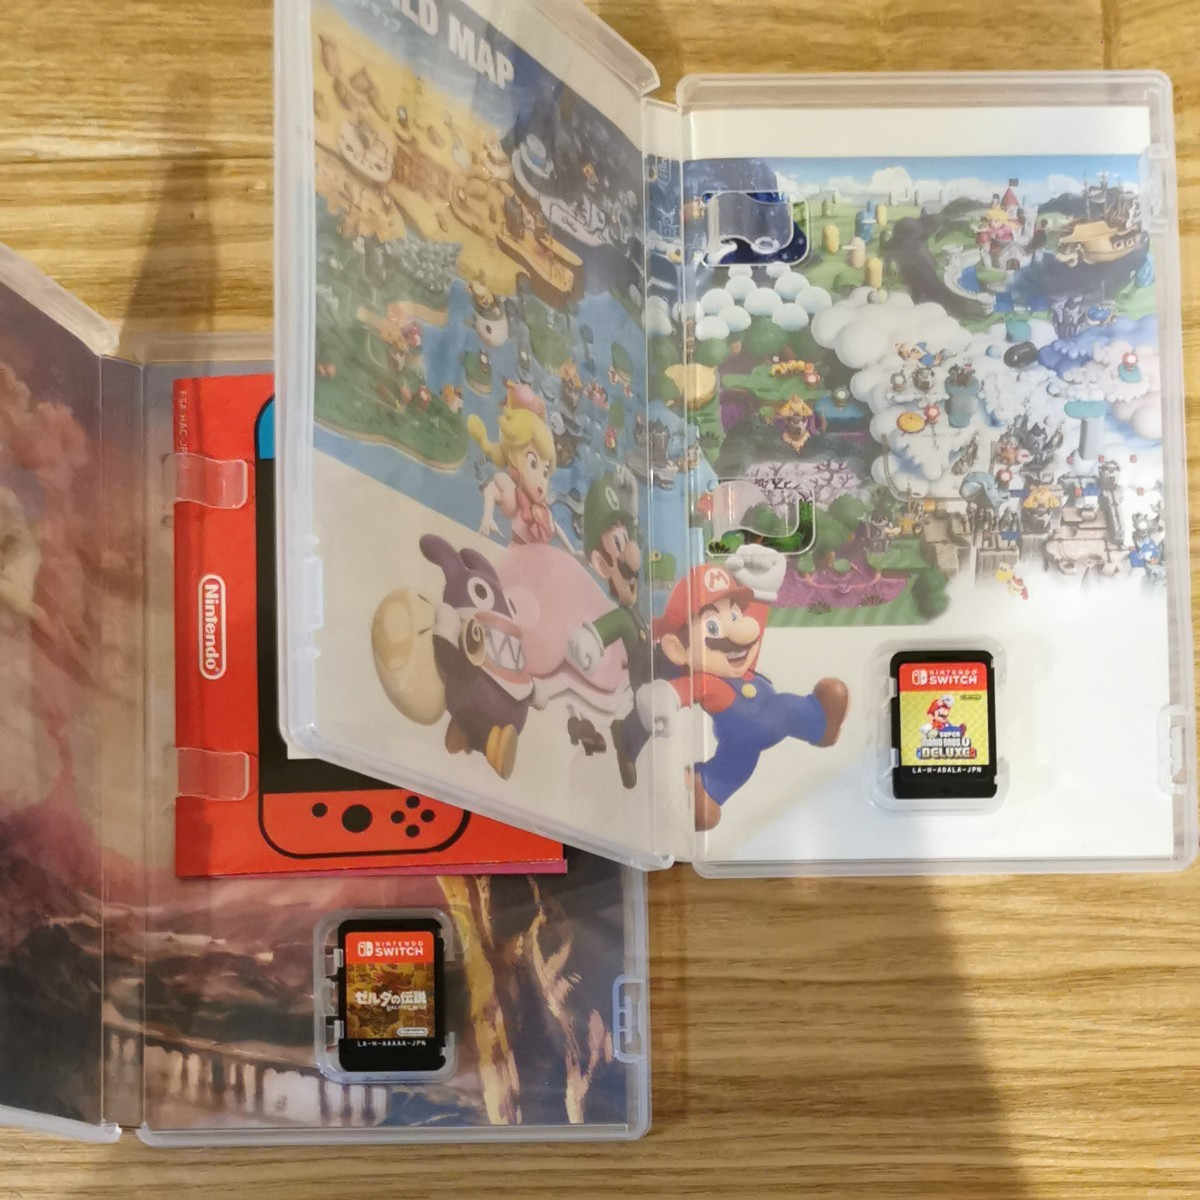 Nintendo Switch 大乱闘スマッシュブラザーズspecial NewスーパーマリオブラザーズU セット